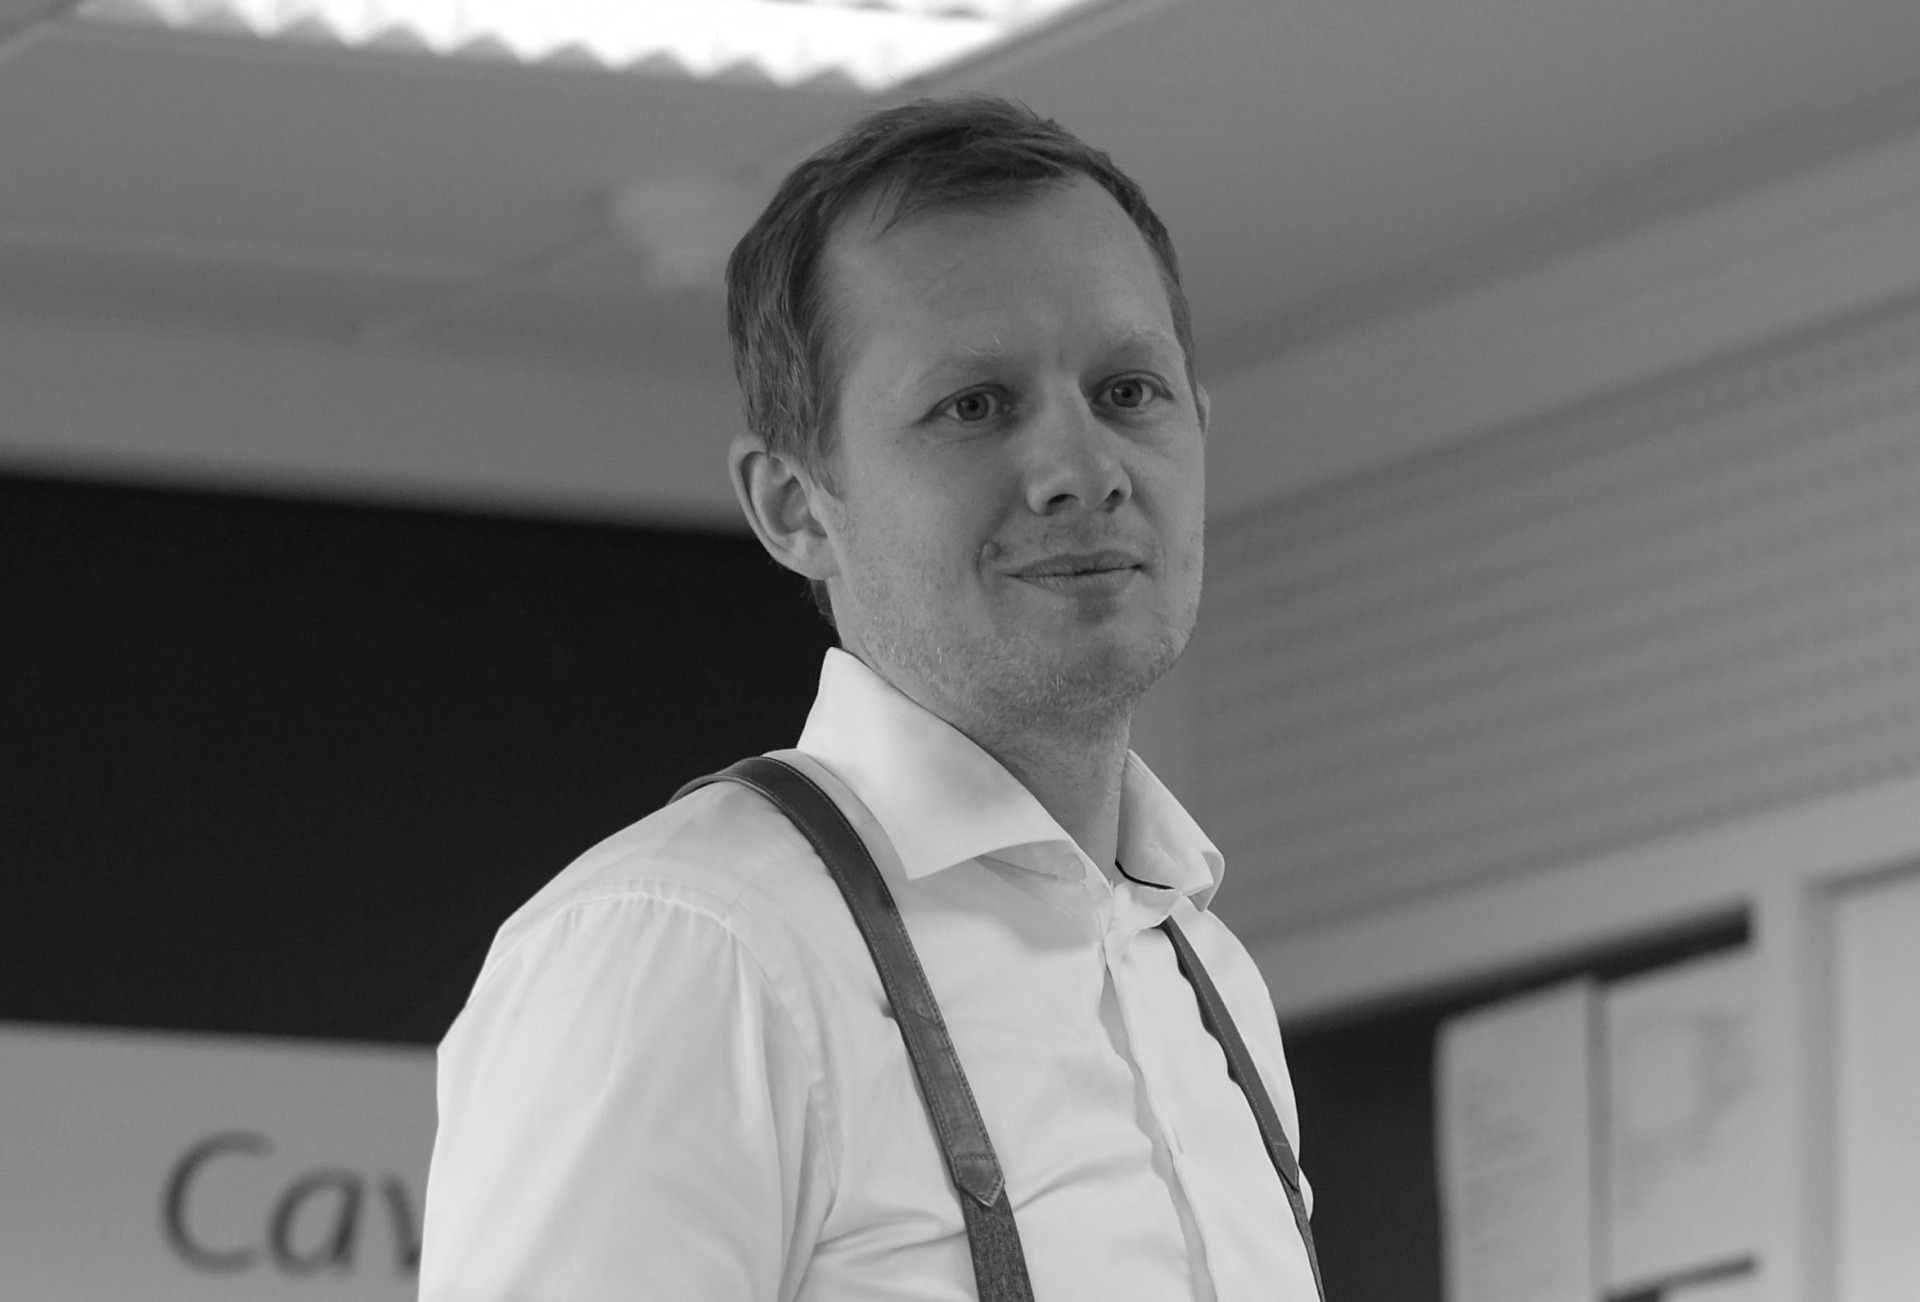 CEO of Cavi-art Jens Christian Møller Jr